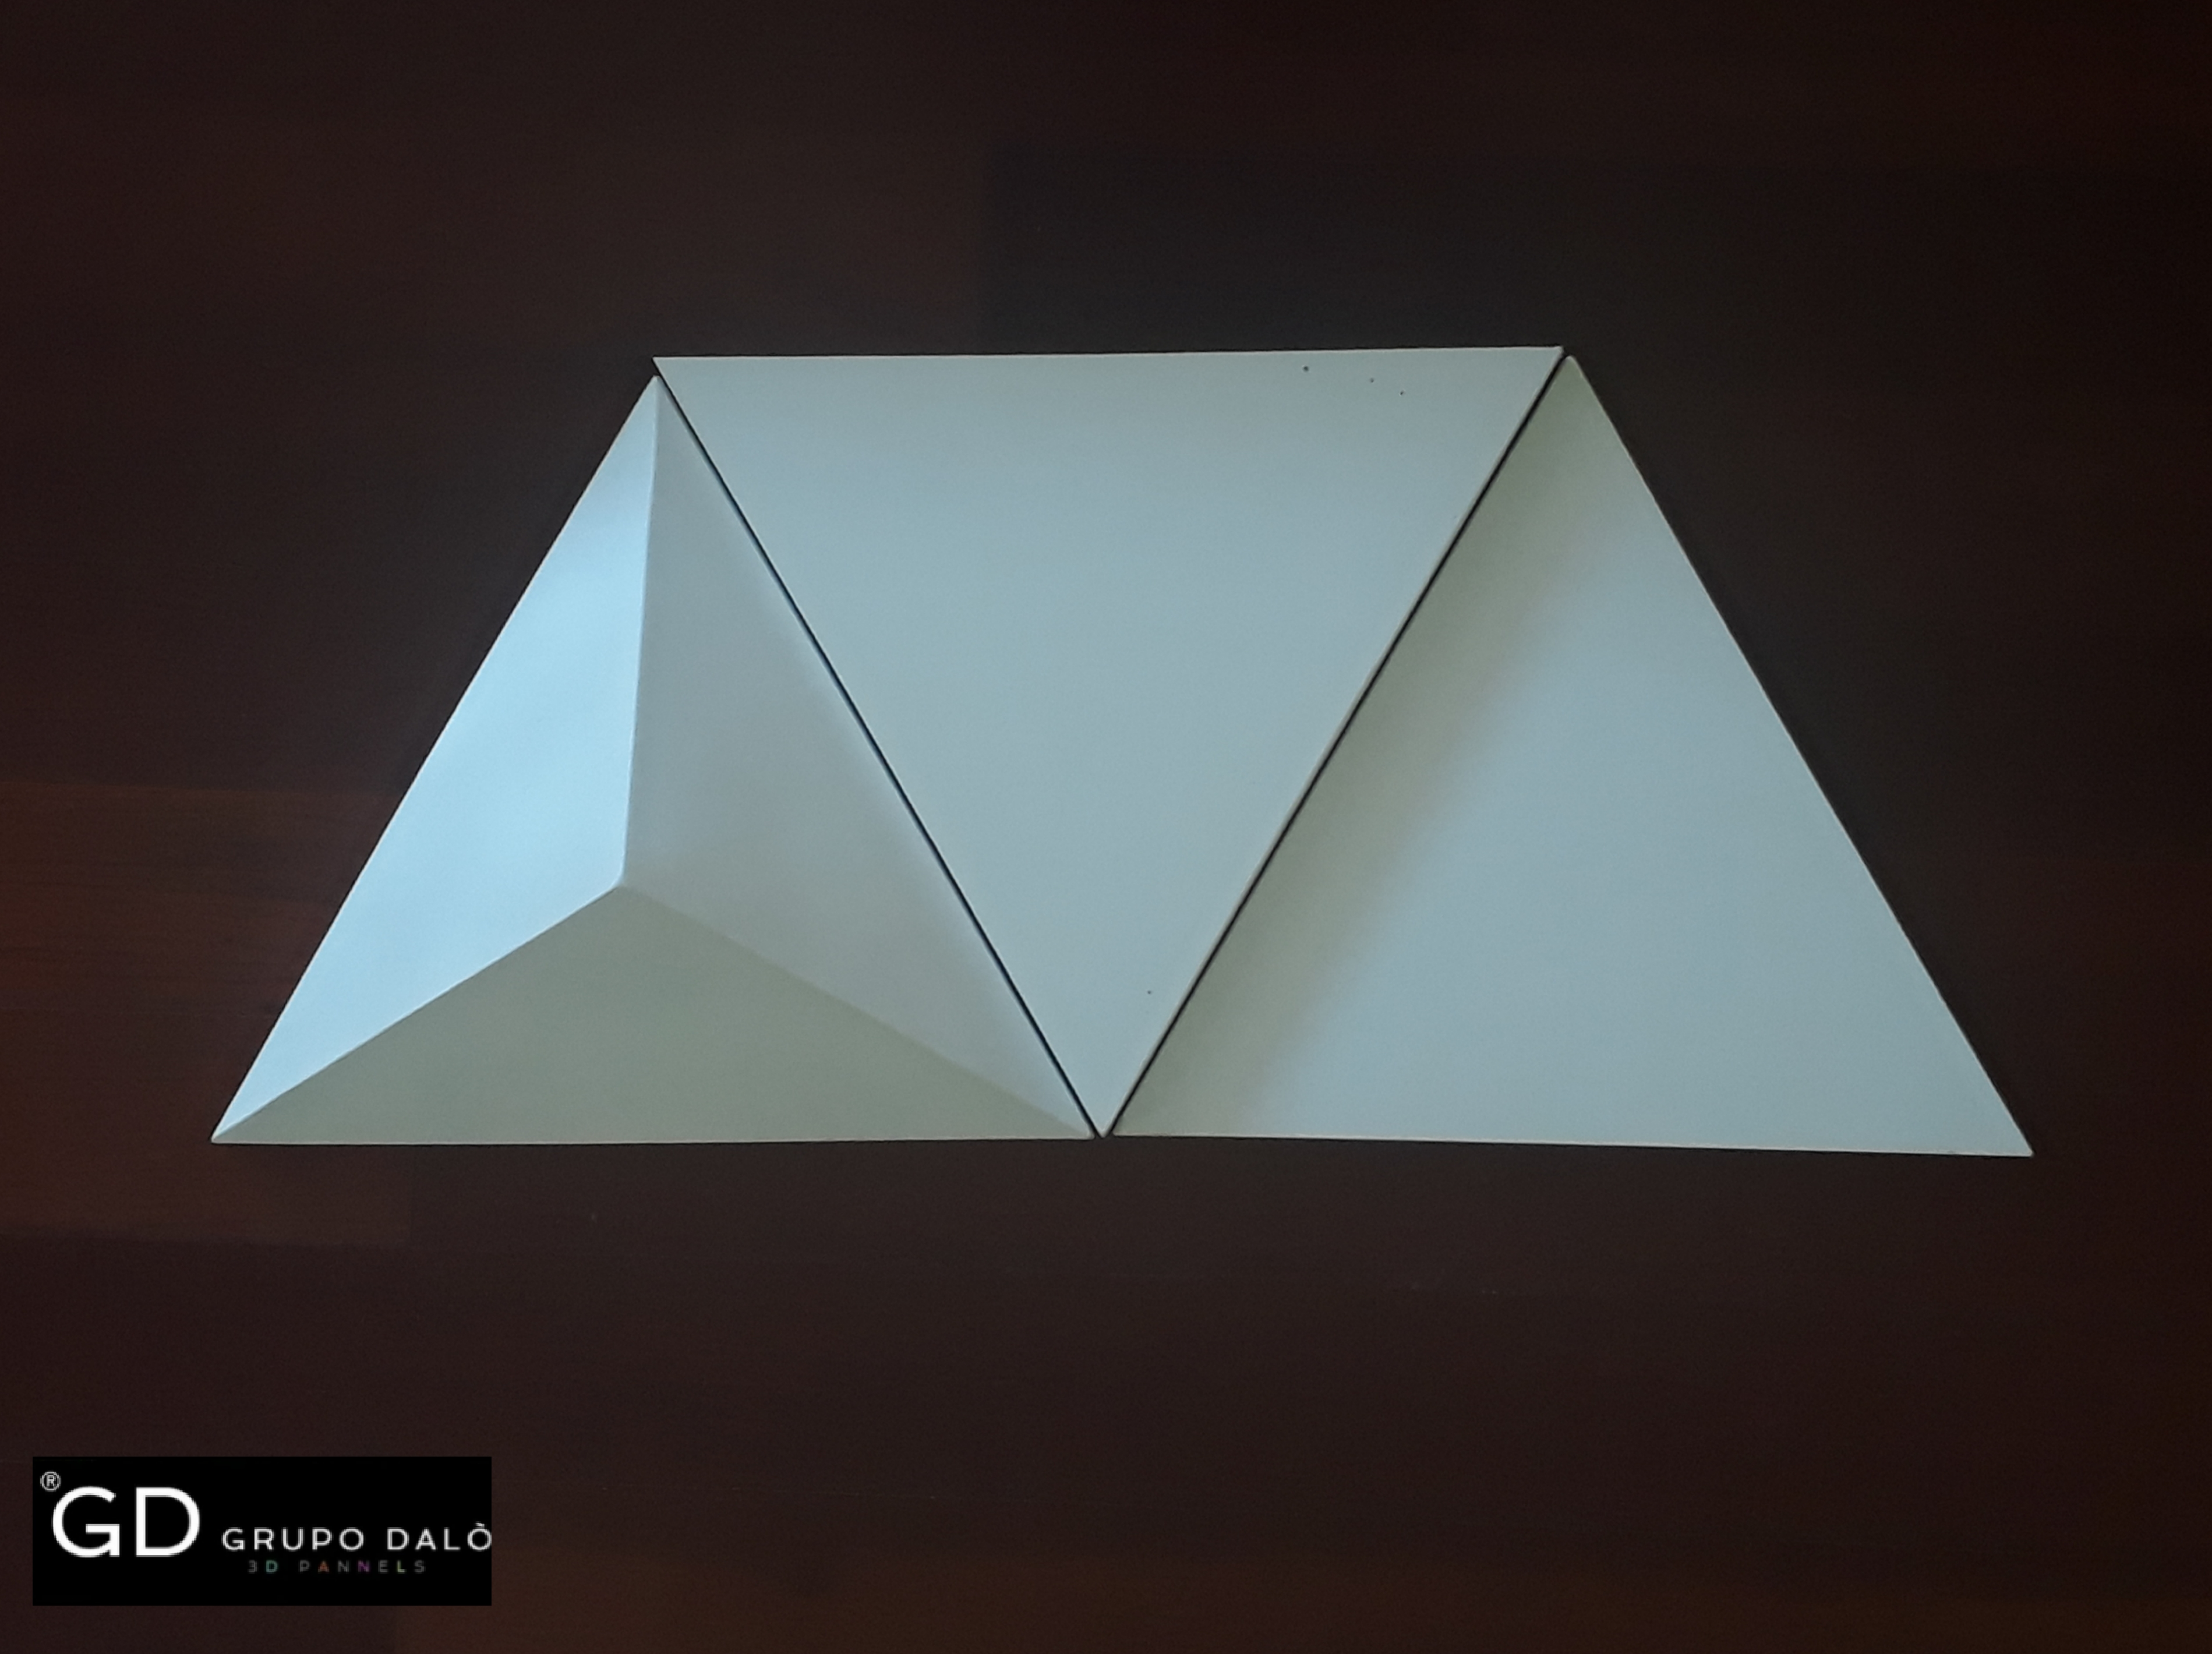 Triángulo Piramidal